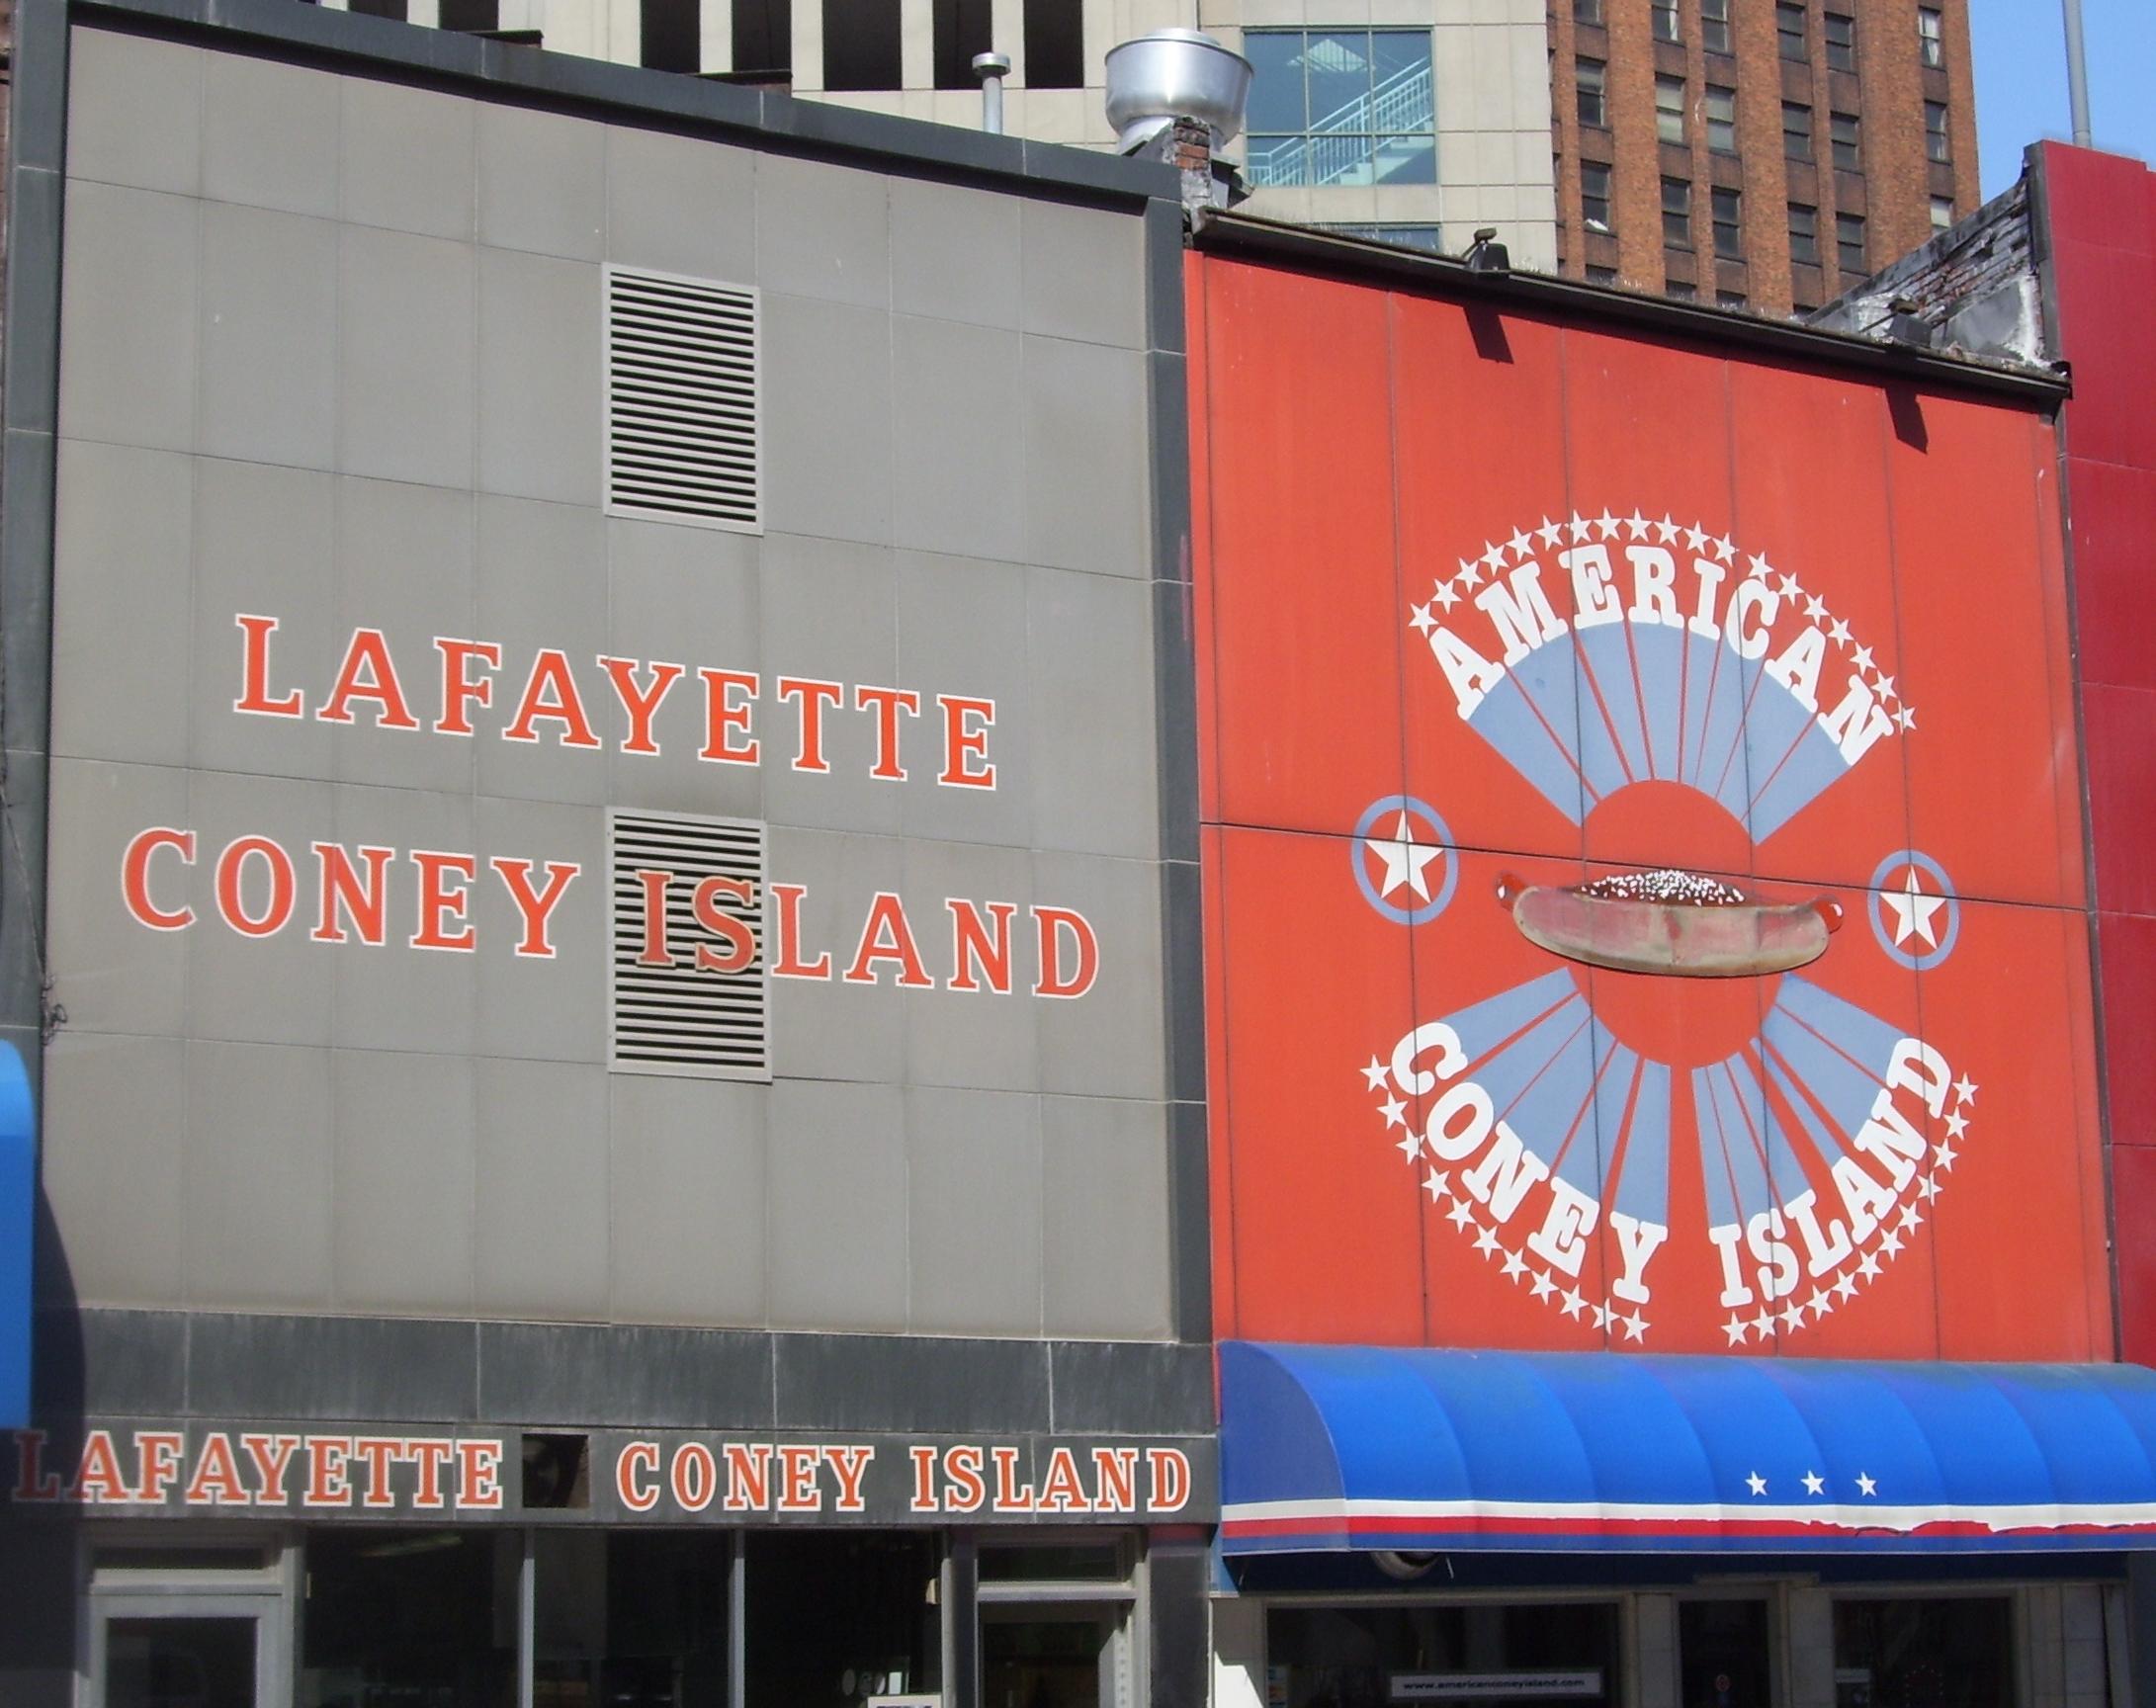 Lafayette Coney Island Detroit